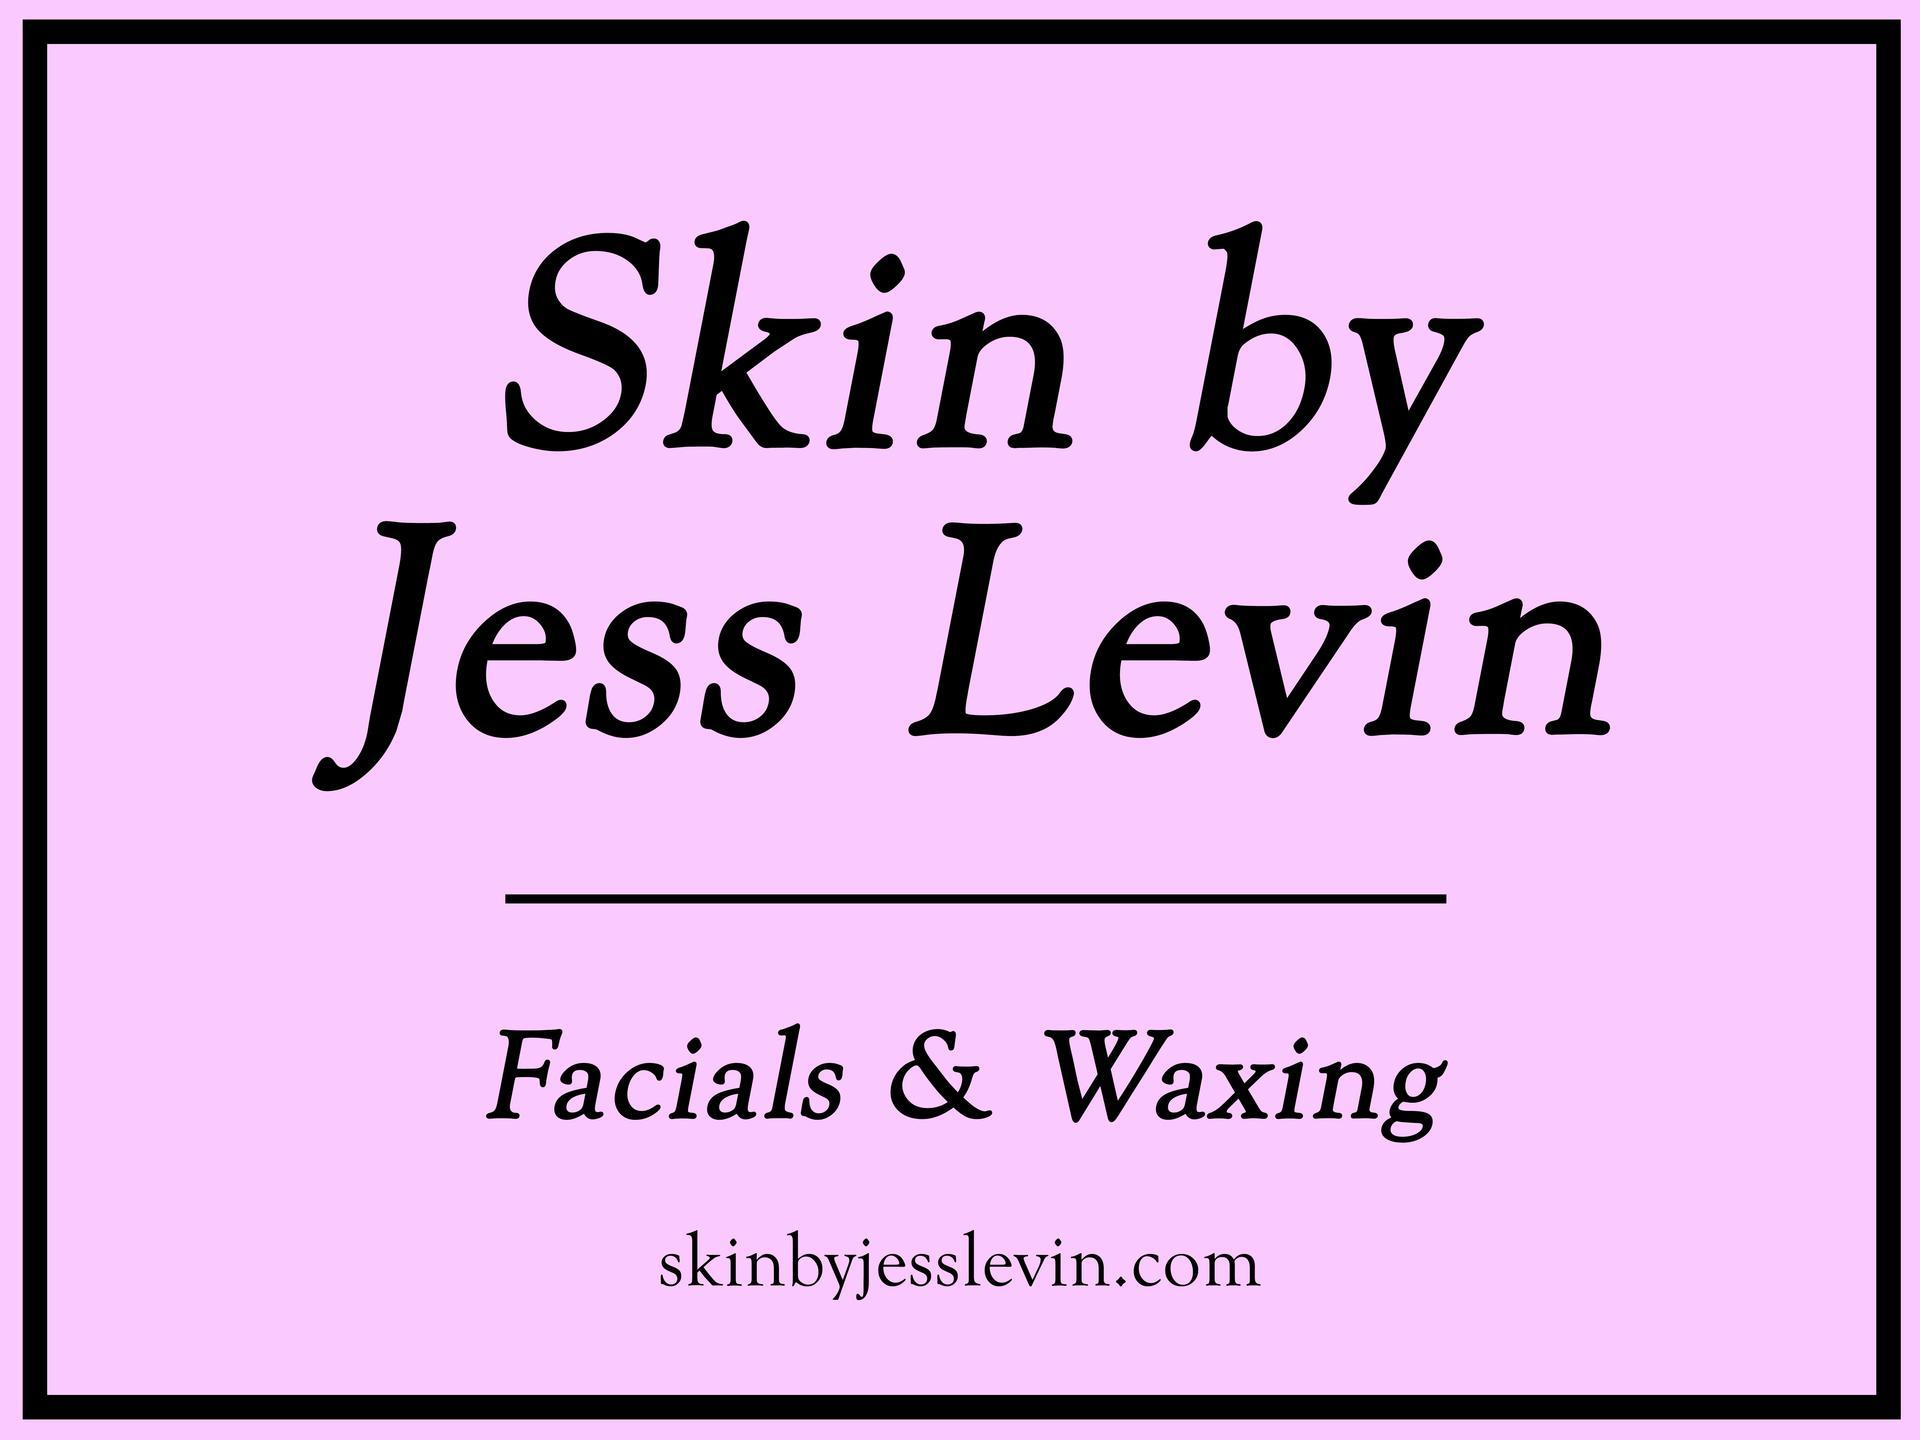 skin by jess levin logo